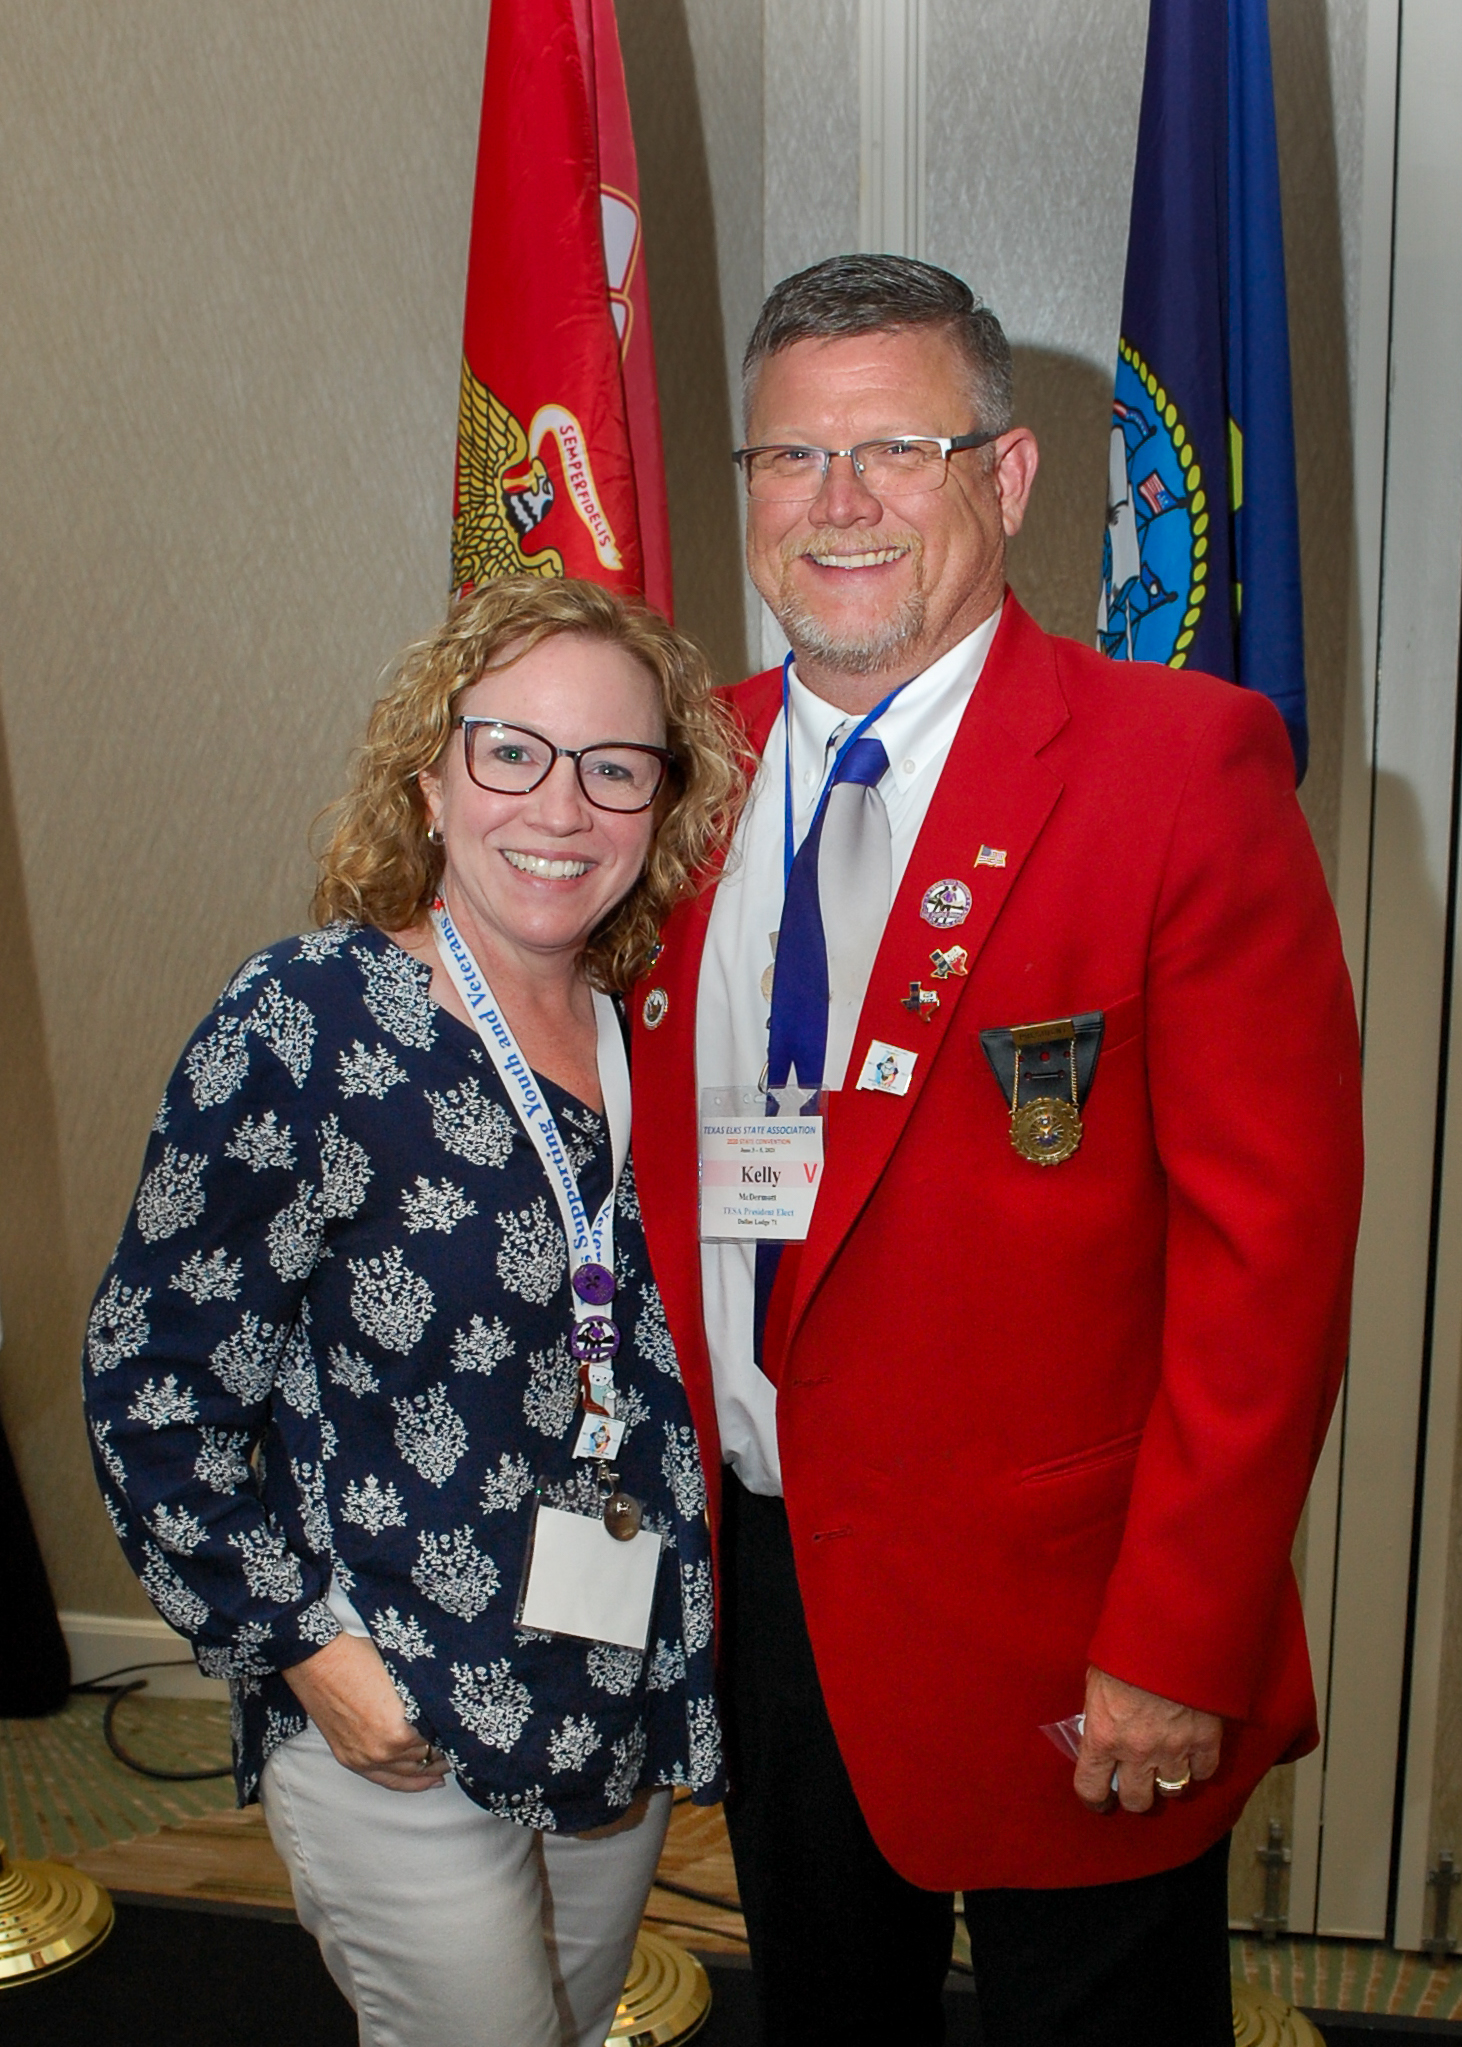 TESA State President Kelly McDermott & First Lady Kim McDermott